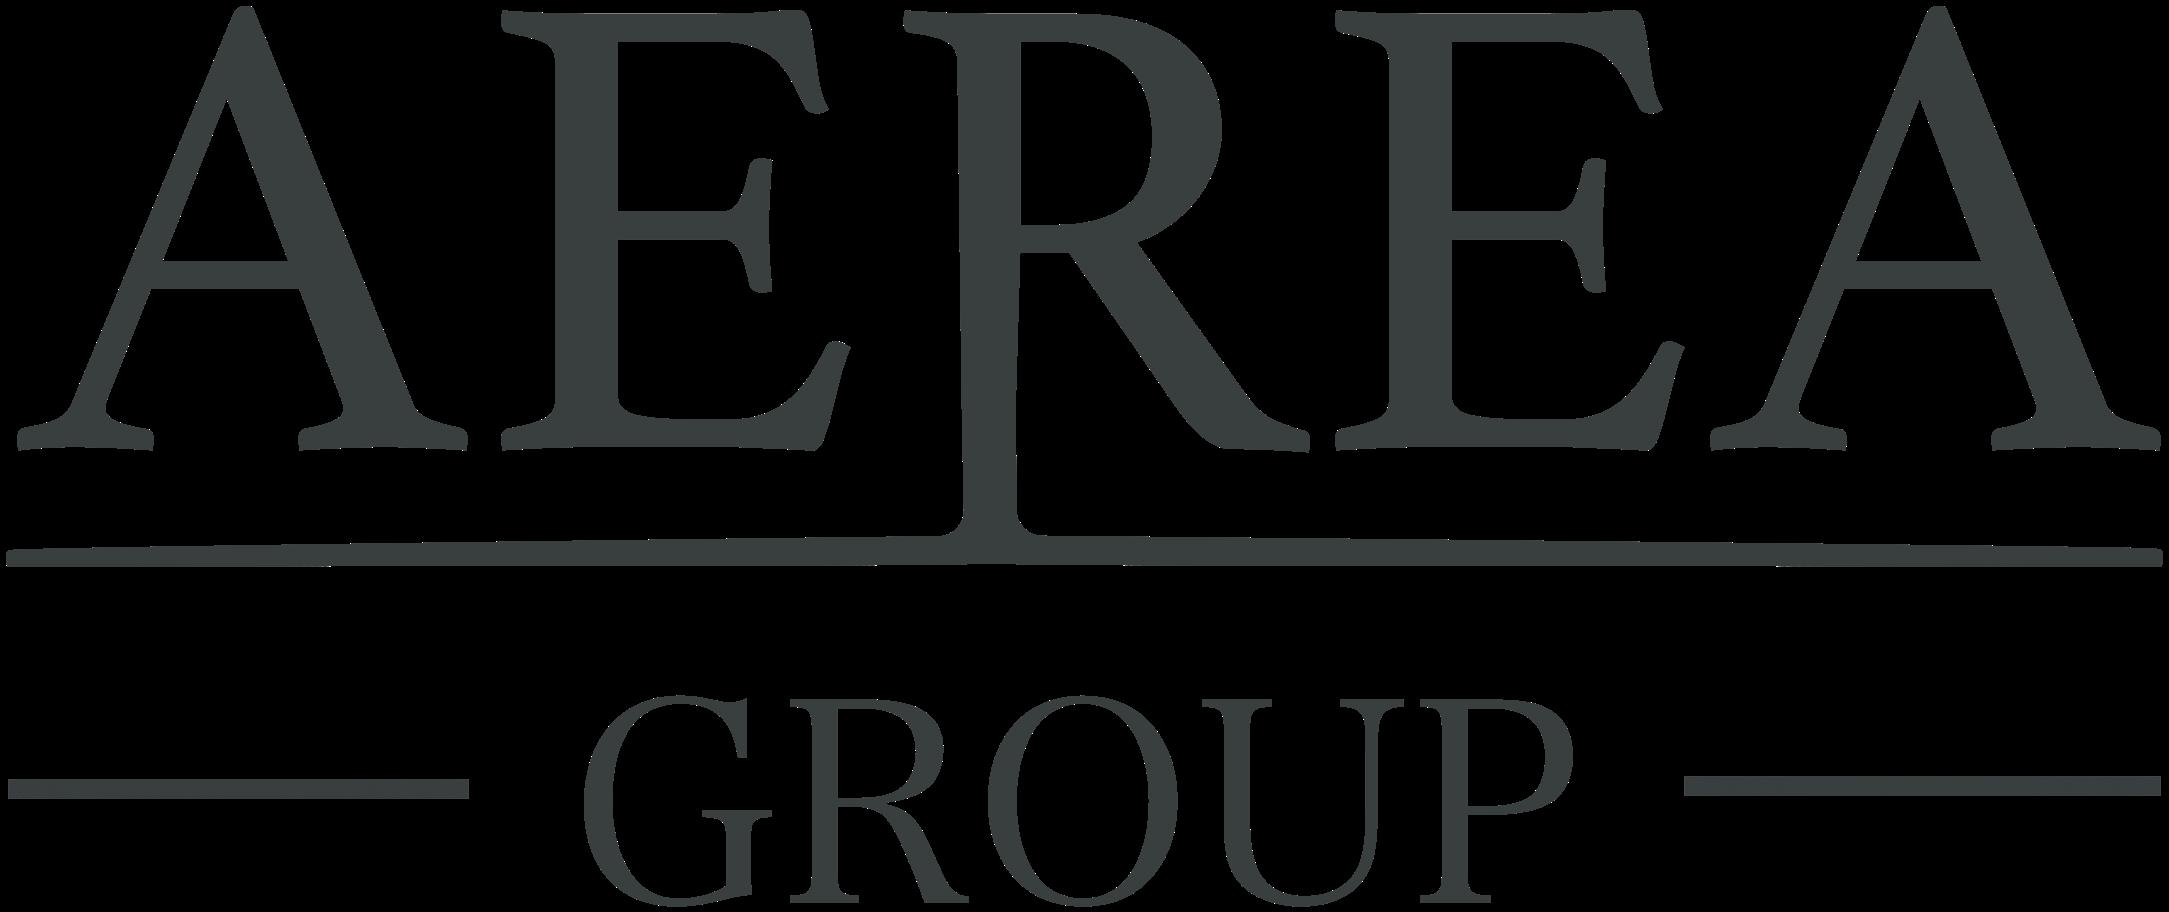 Aerea Group